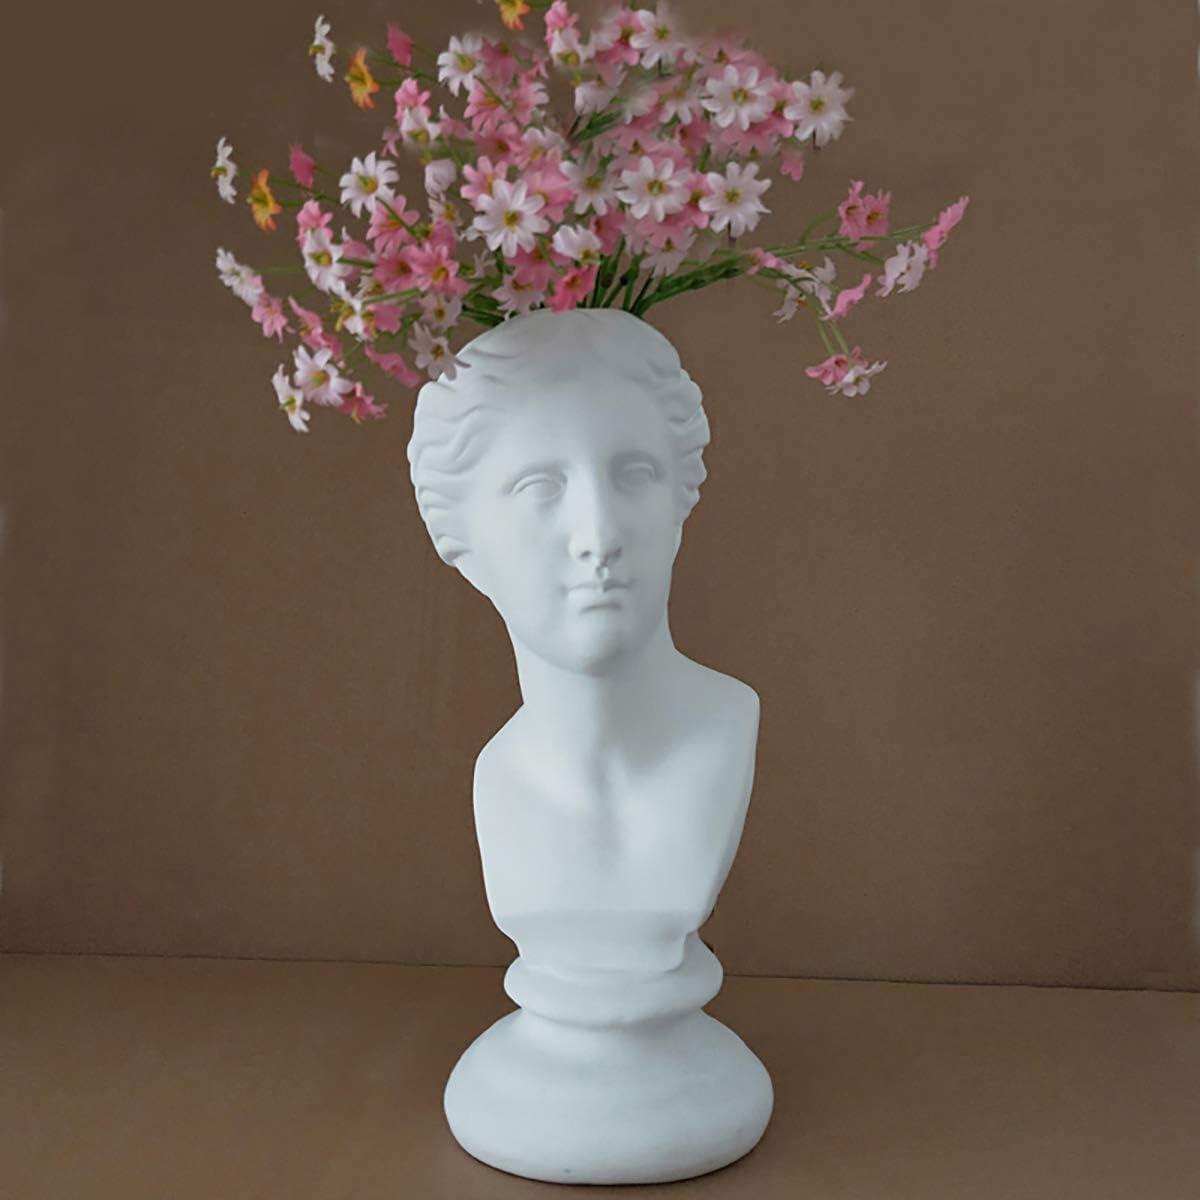 LKXHarleya 11.8 Inch Classic Venus de Milo Resin Statue Statue Vase Heads Planter Sculpture Replica Aphrodite Home Garden Decor